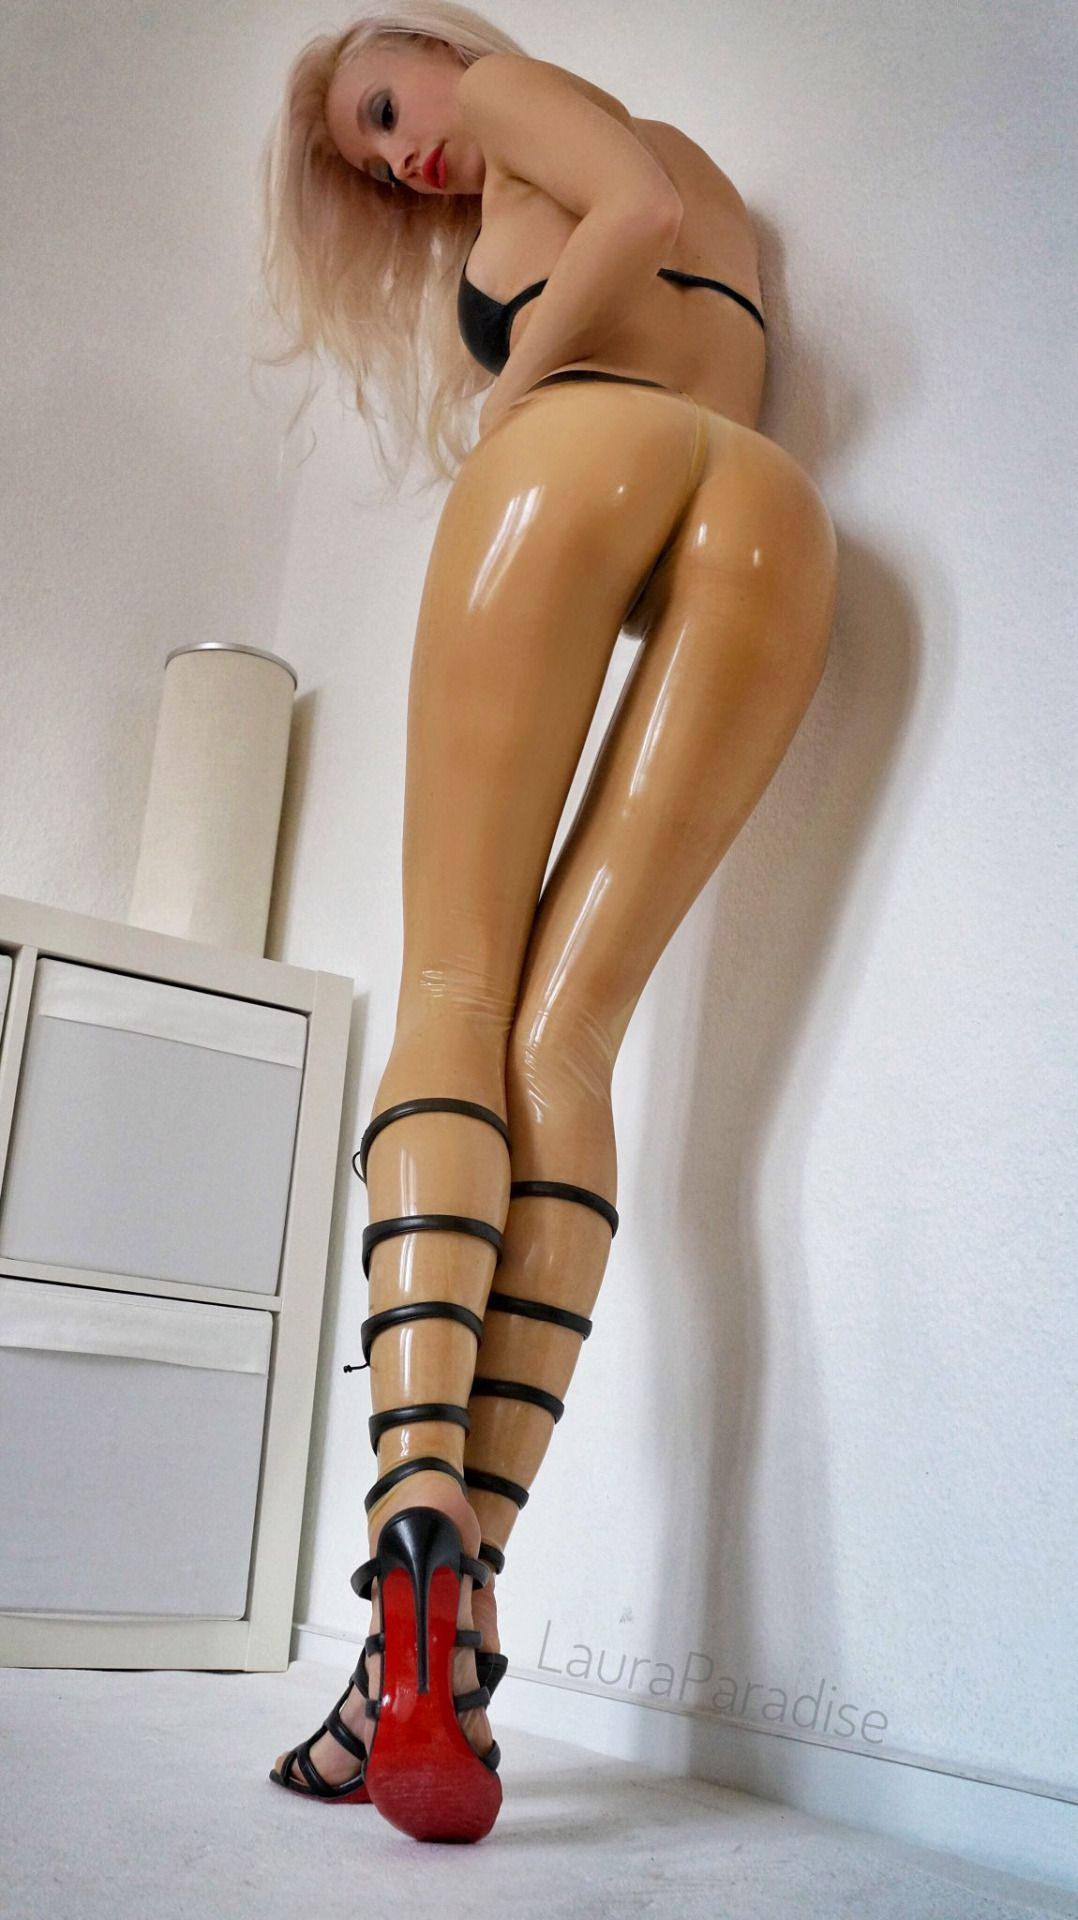 geschäftsreise sex overknee stiefel für dicke waden